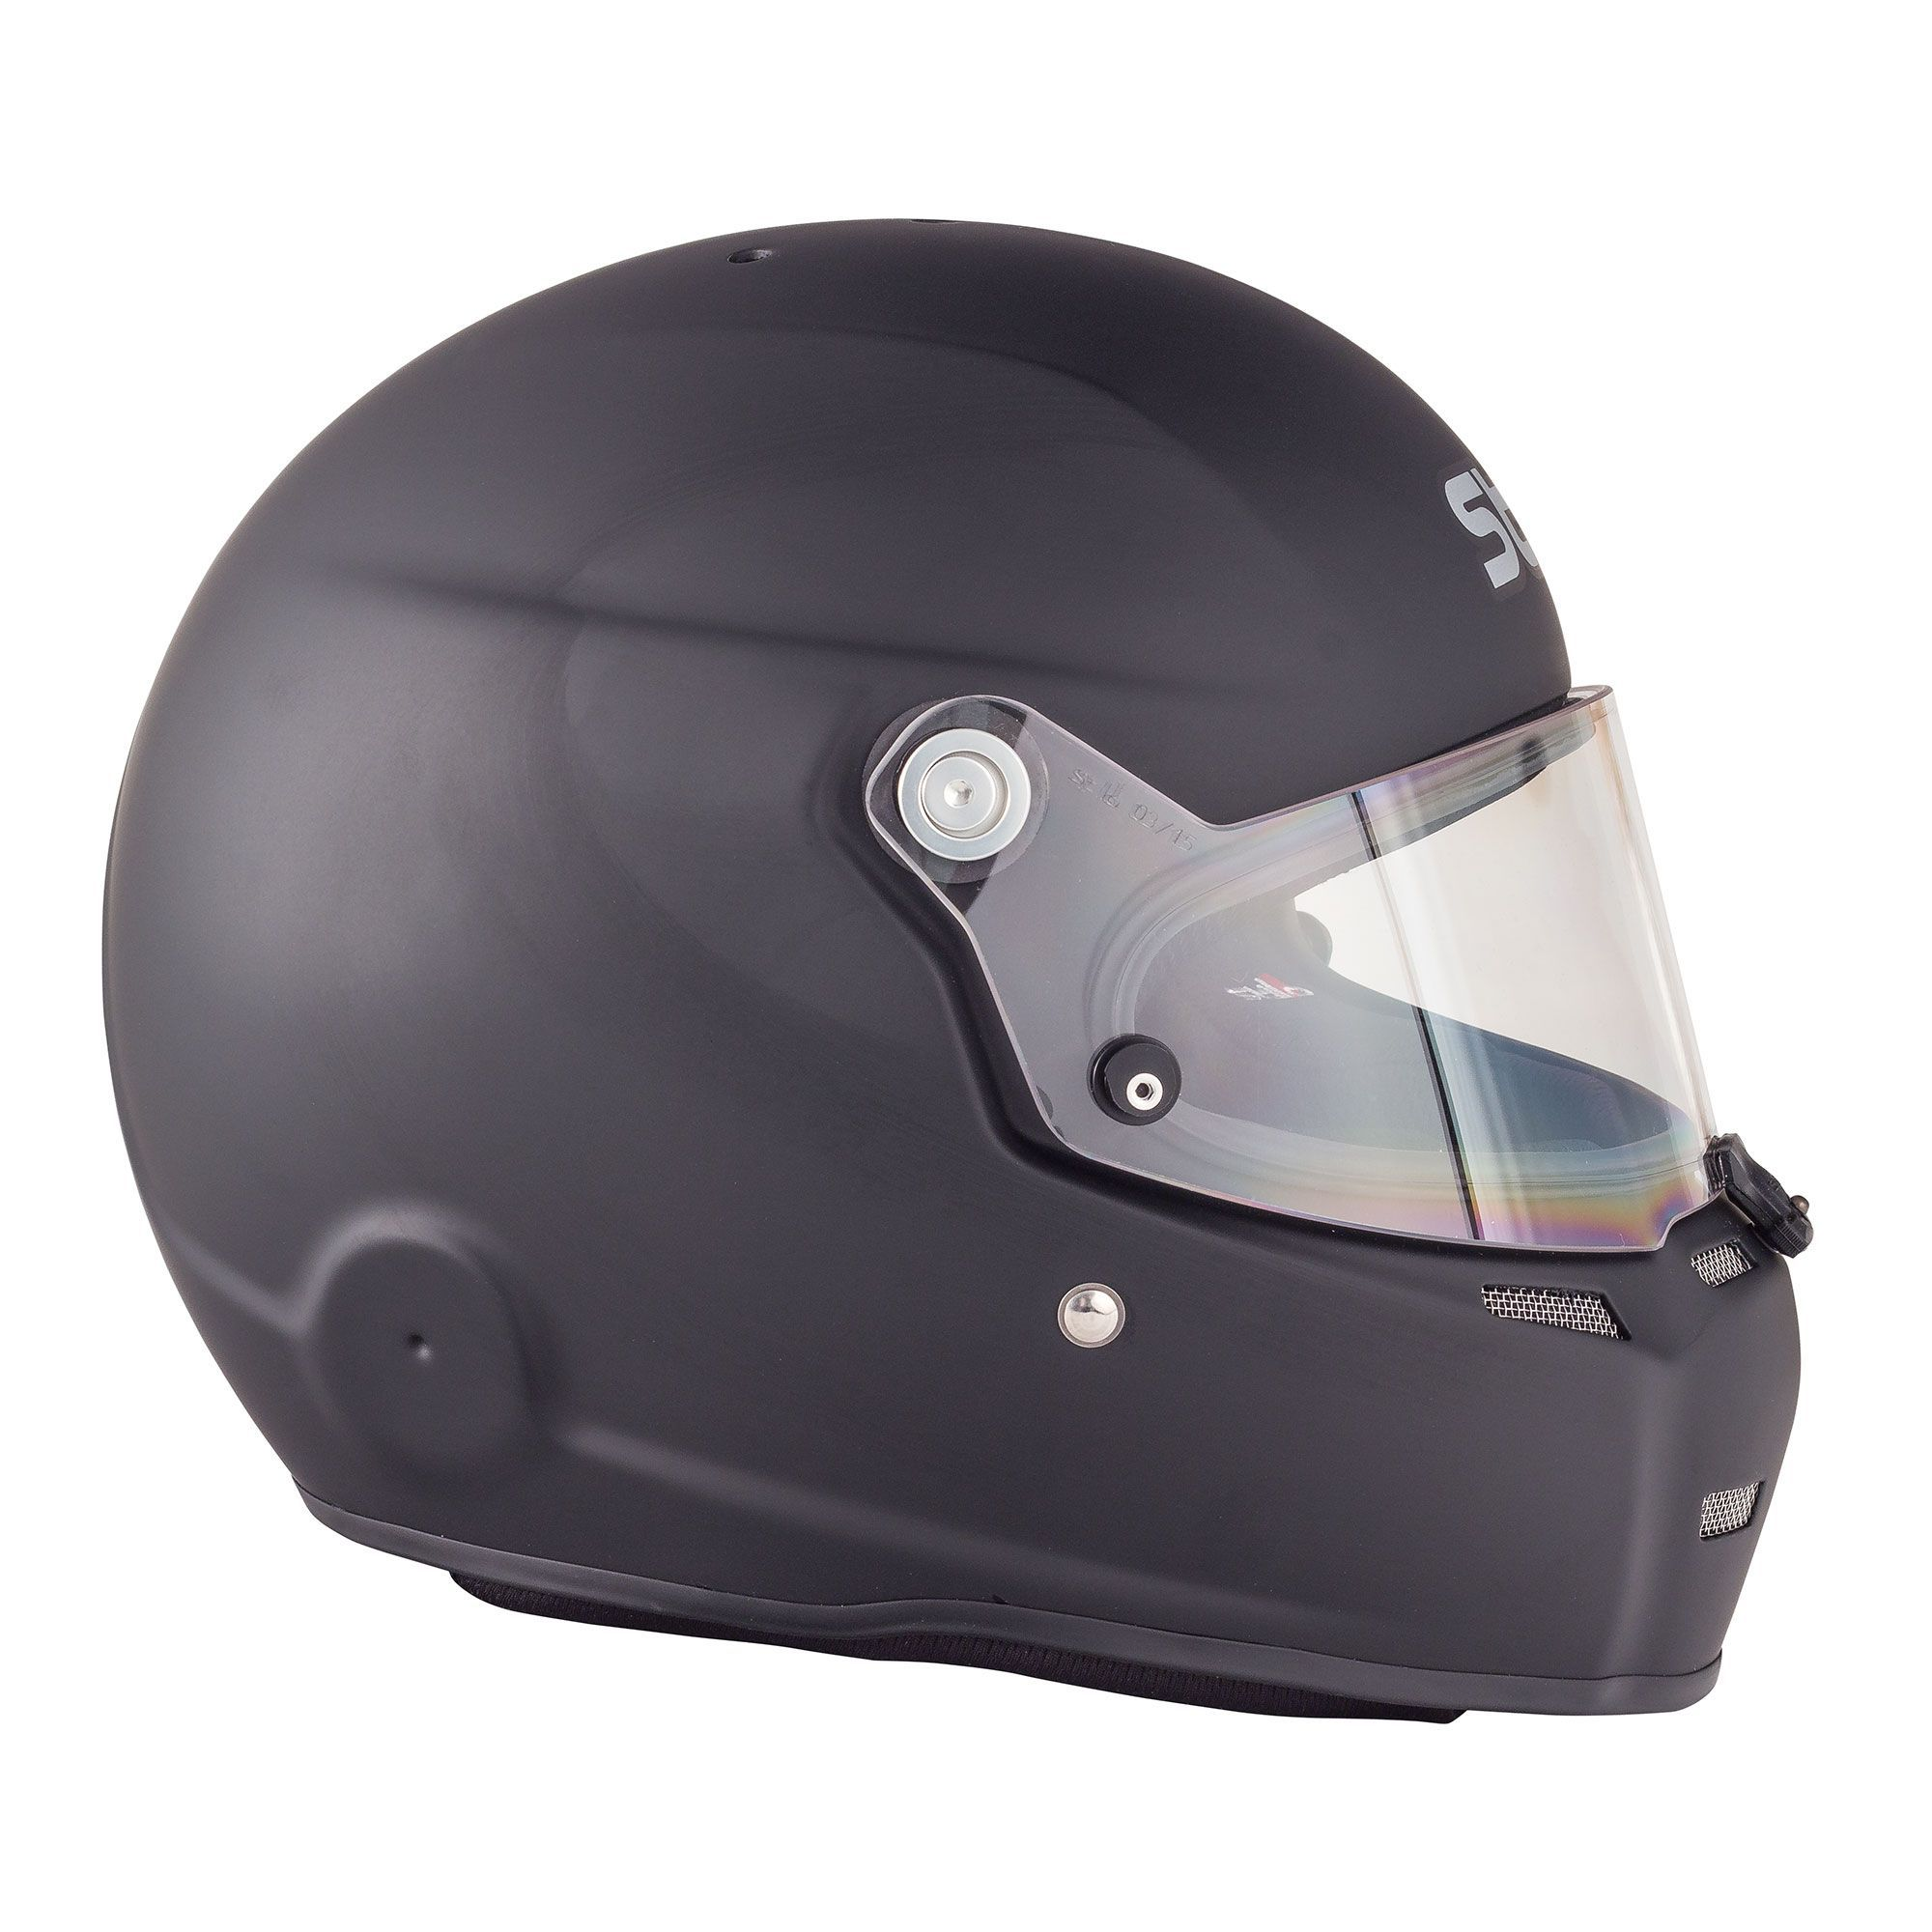 Stilo ST5 Helmet - CMR2016 - Black